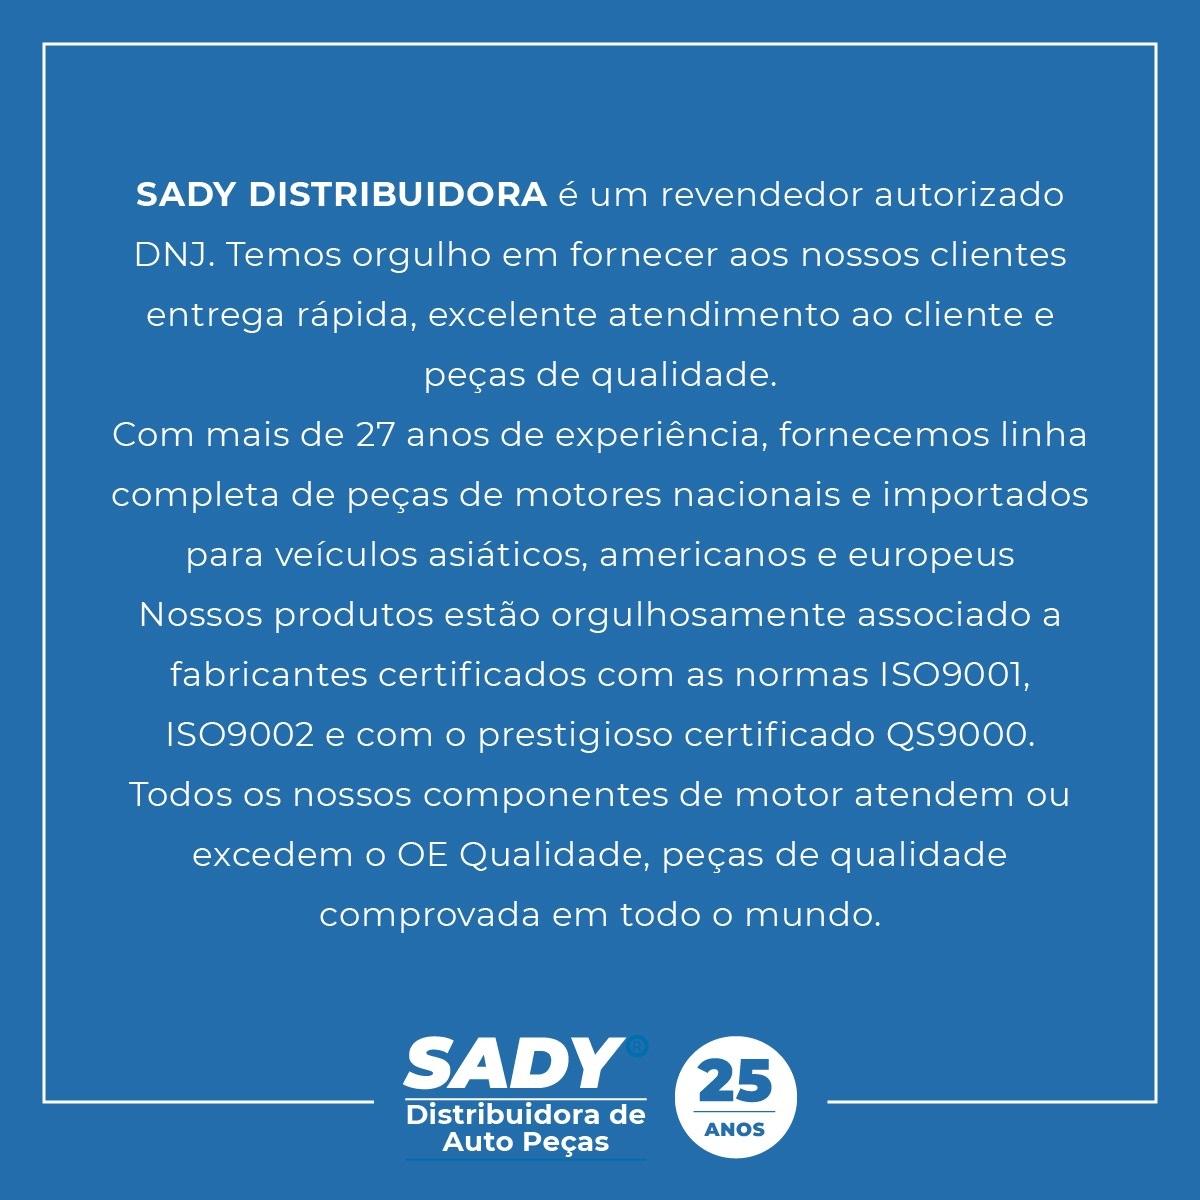 BOMBA DE OLEO DO MOTOR HONDA 1.7 16V 00/05